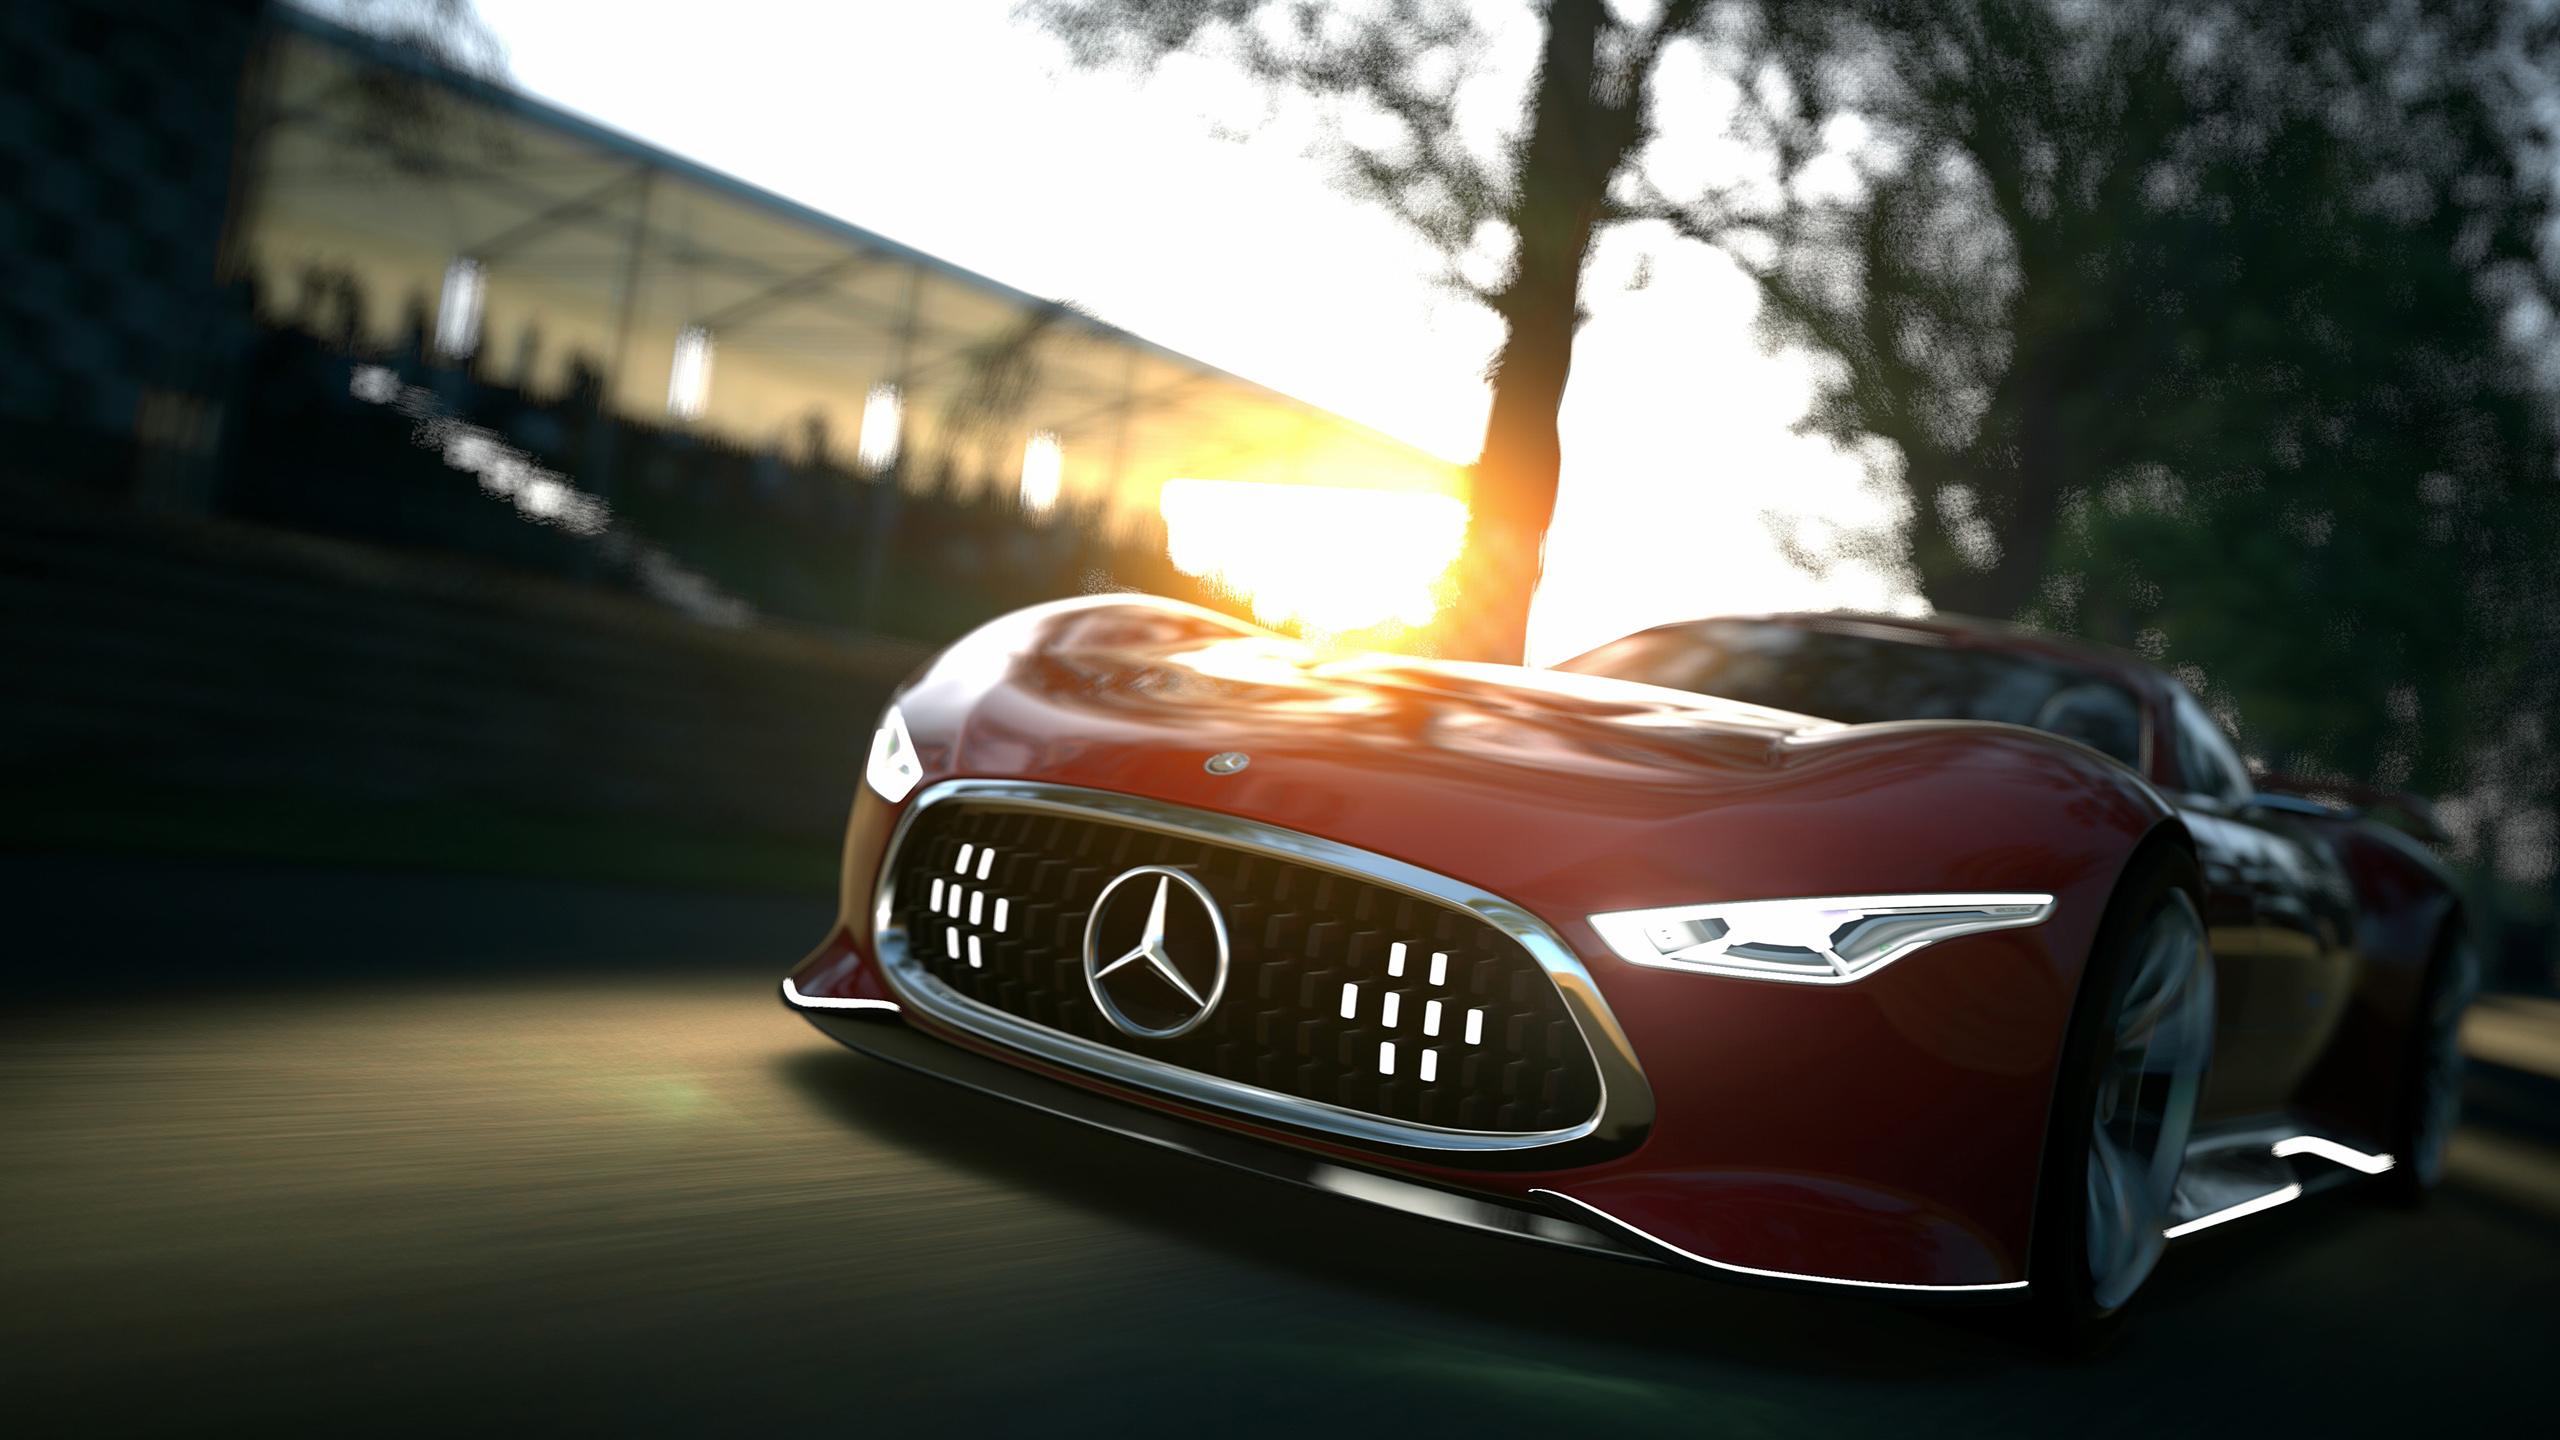 Mercedes Benz AMG Vision Gran Turismo Concept Wallpaper ...